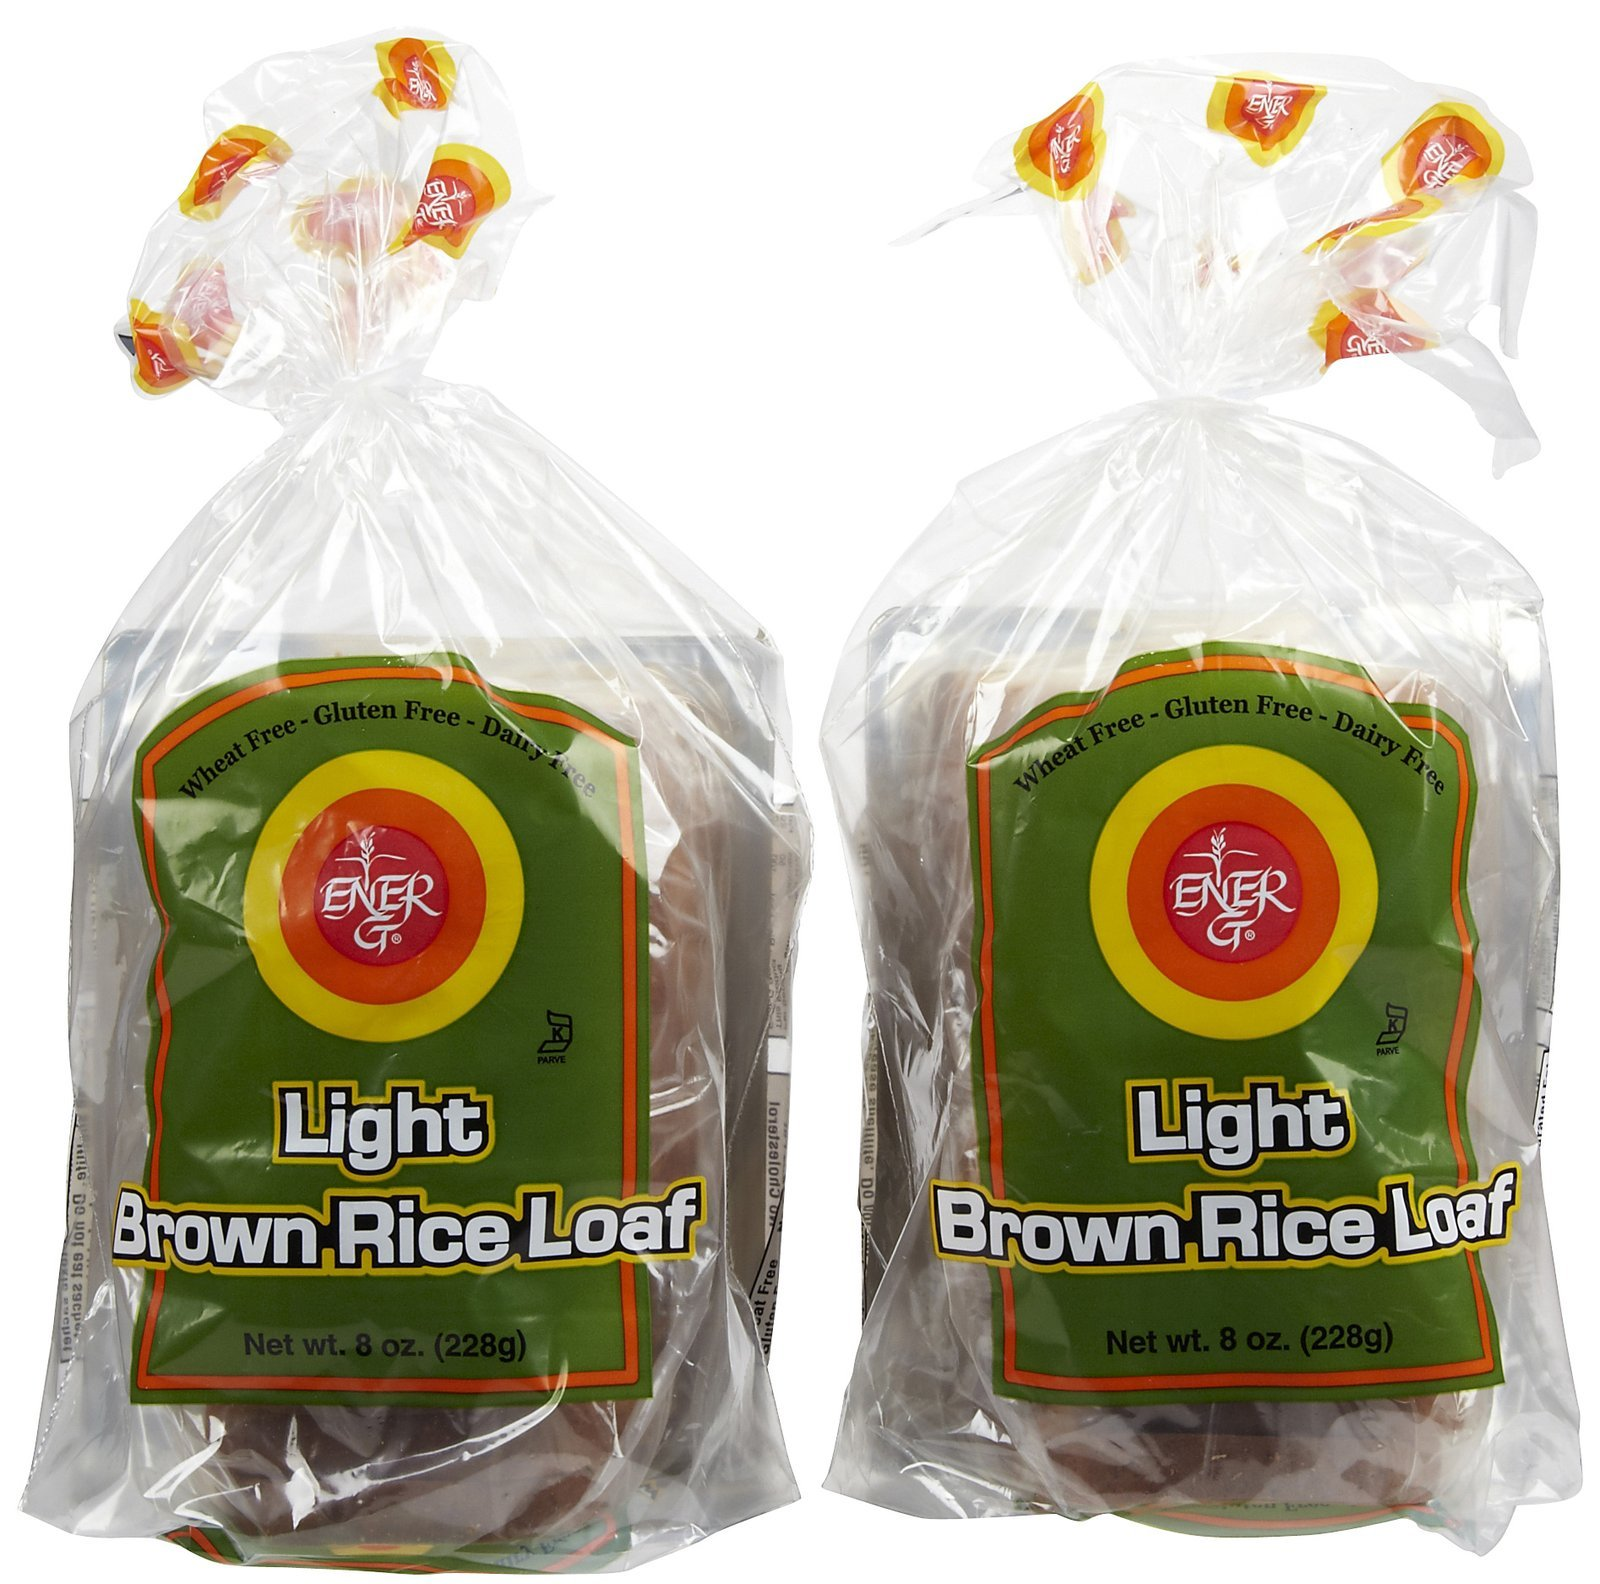 Ener-G Light Brown Rice Loaf, 8 oz, 2 pk by Ener-G Foods